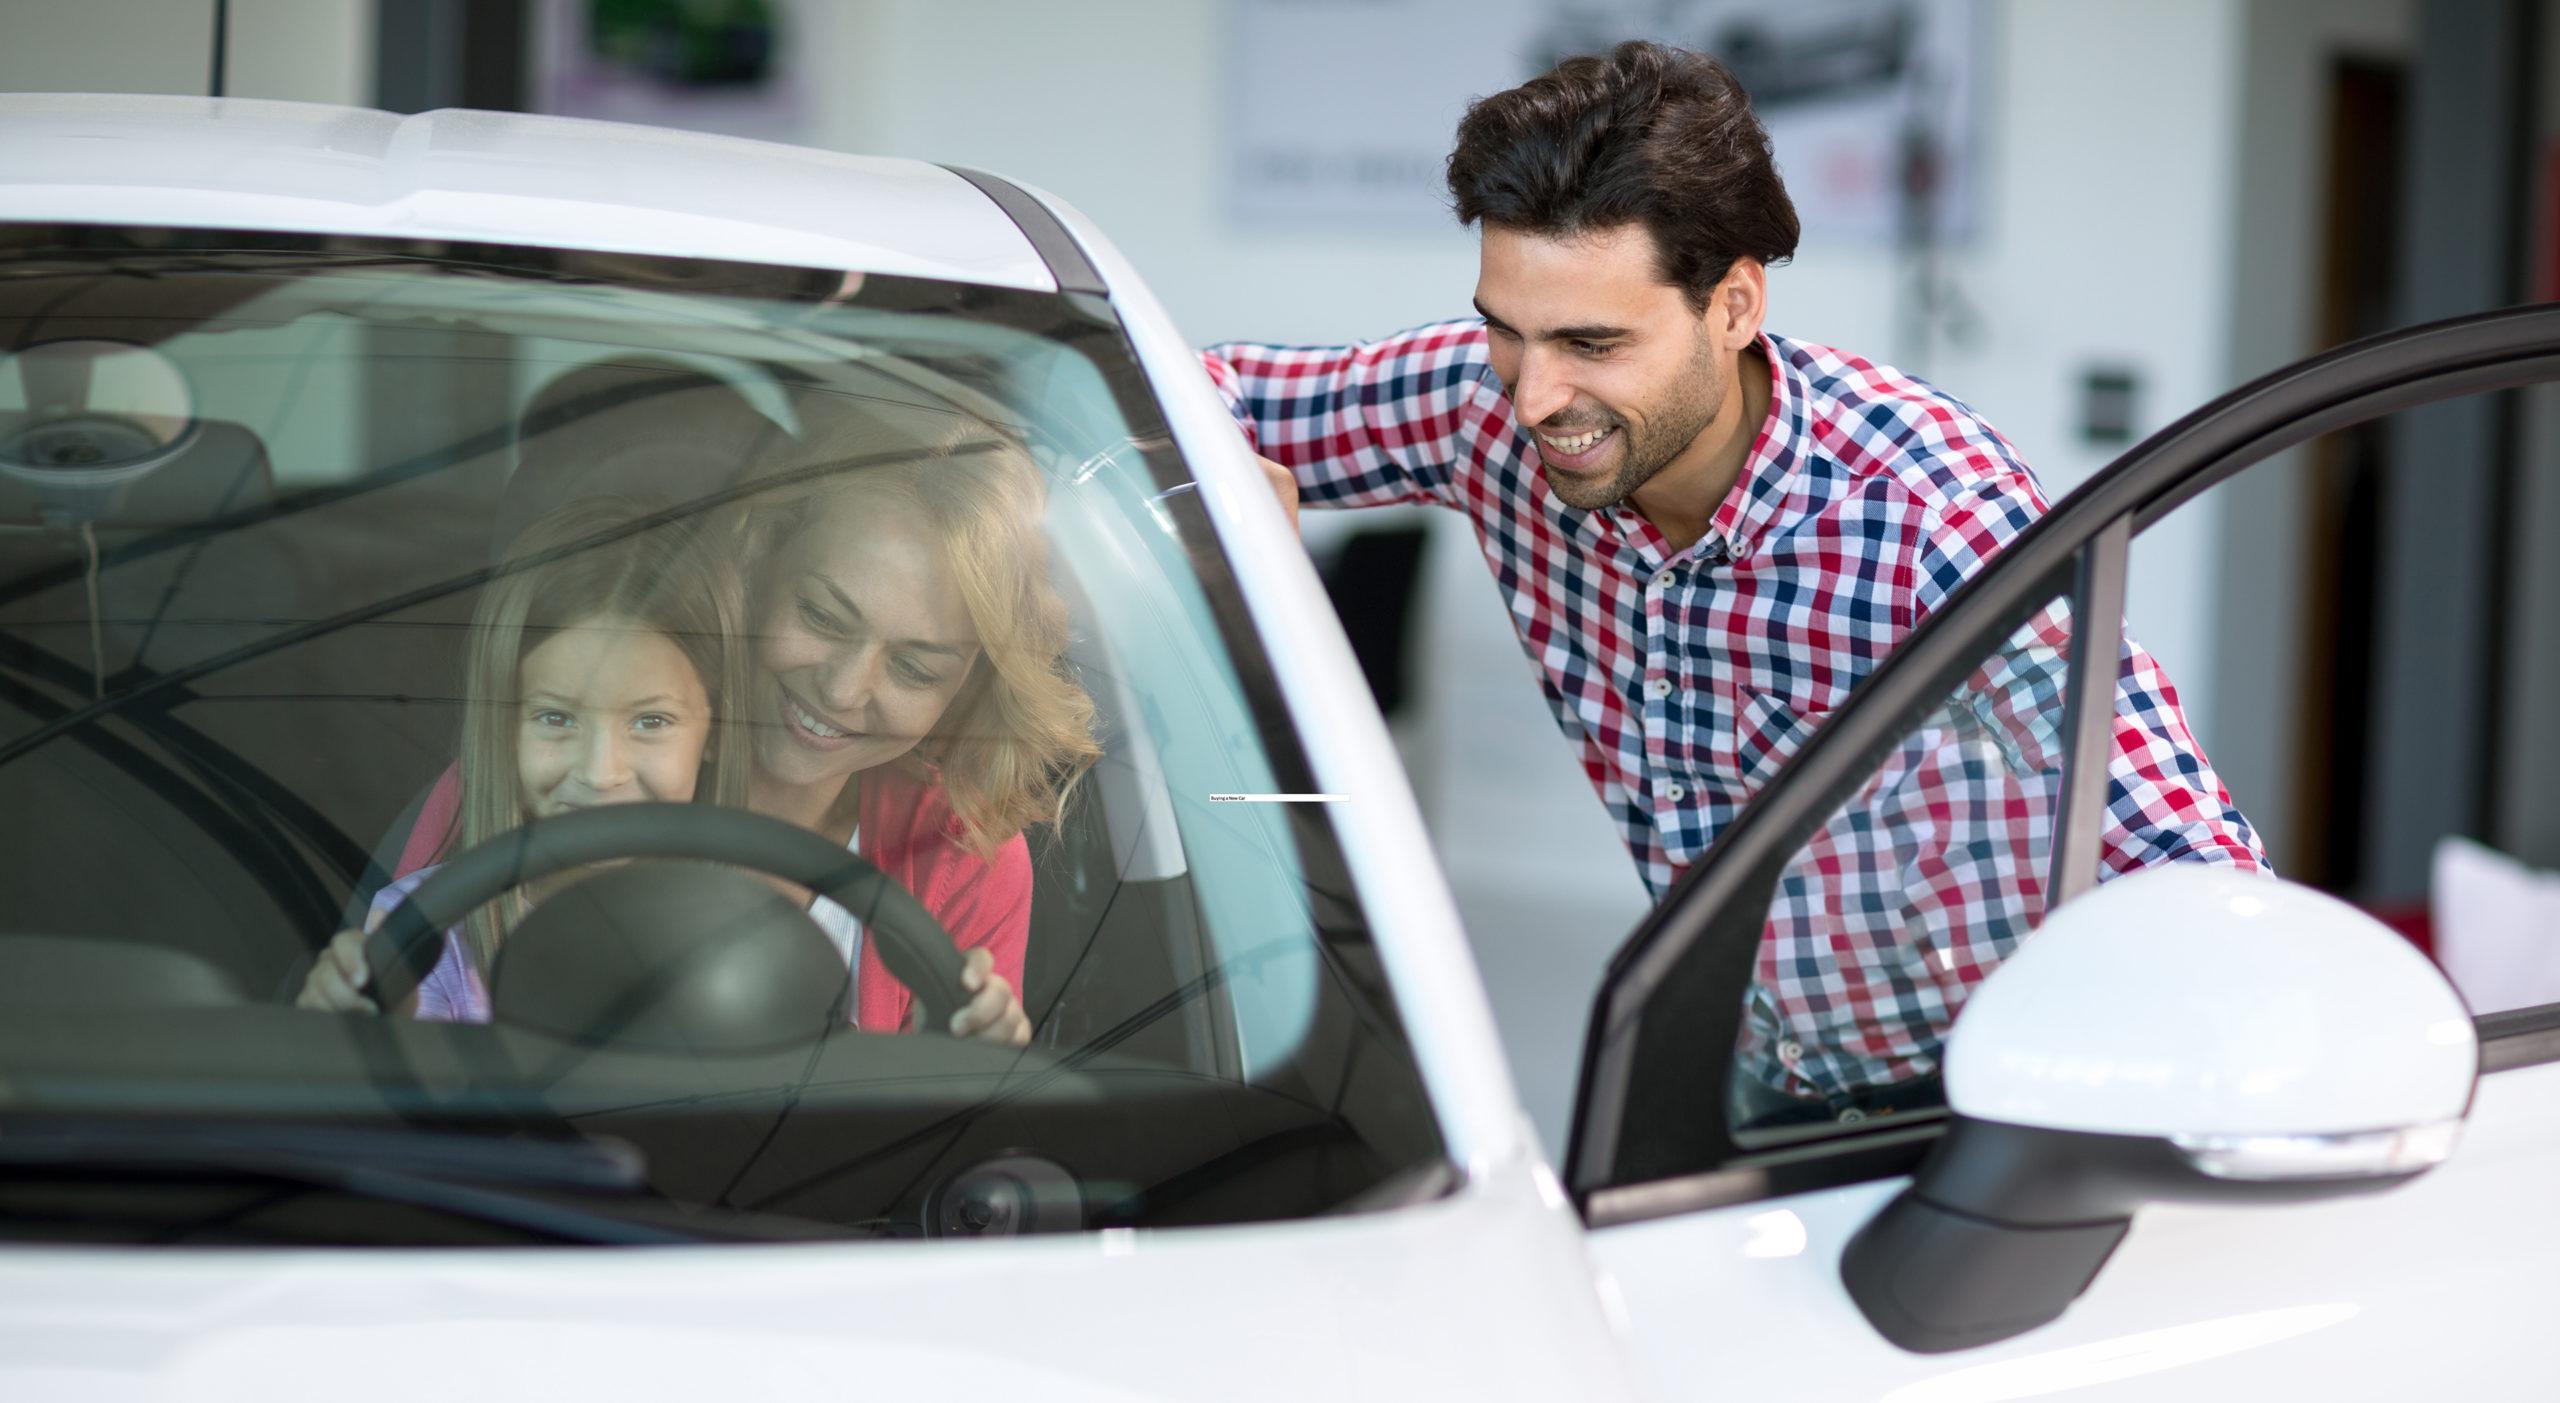 car salesman handshaking with cheerful buyer